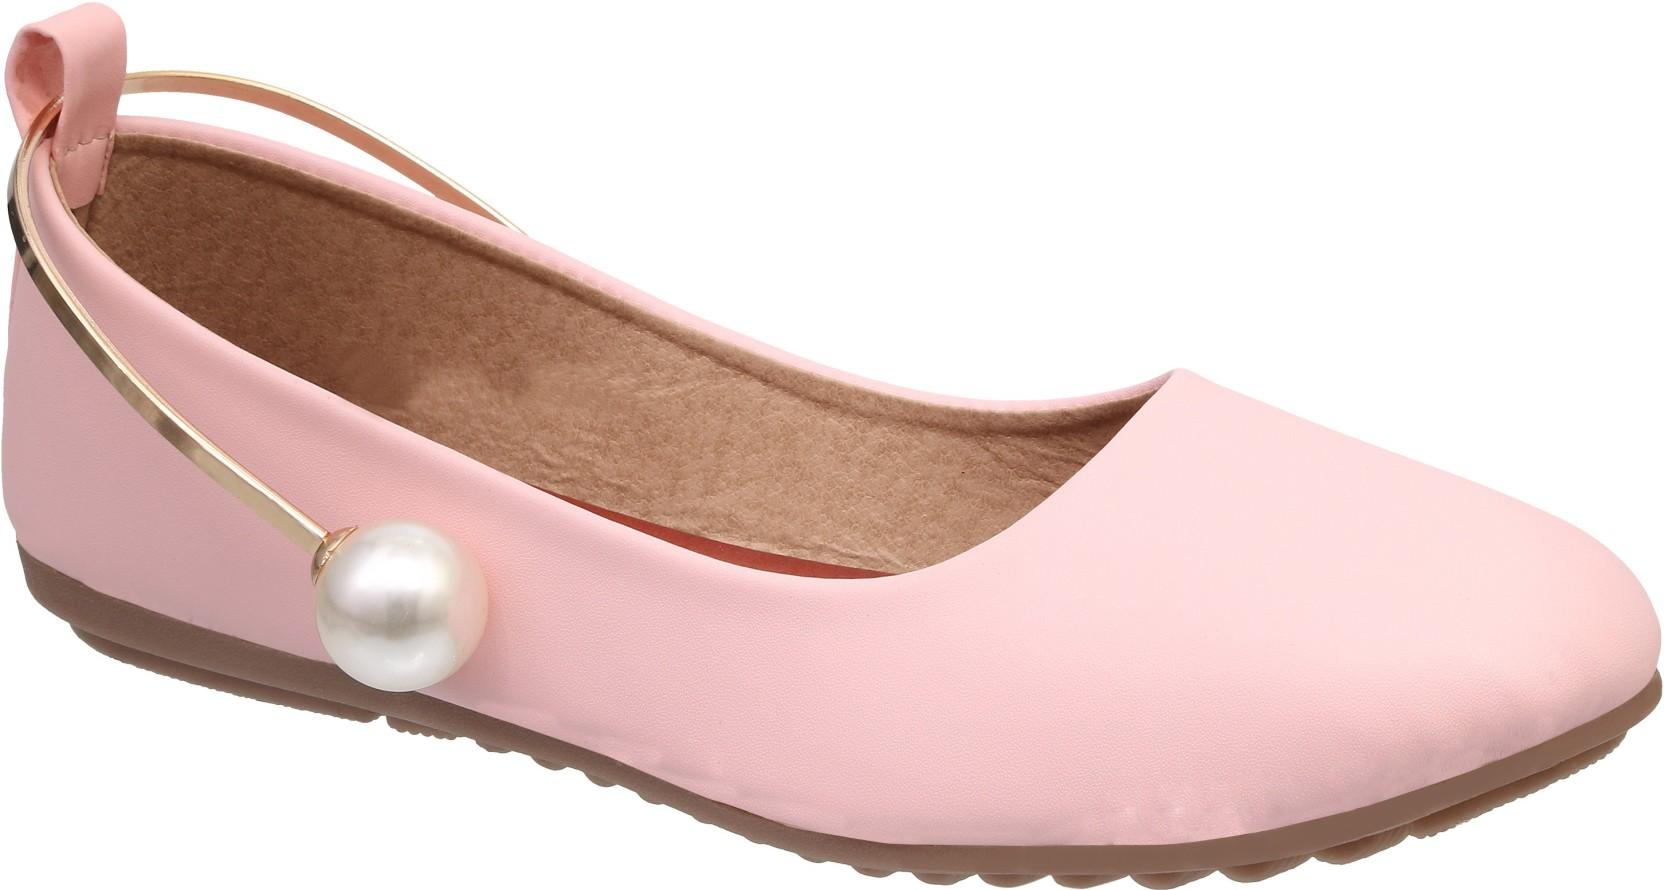 b5315df9216 Sindhi Footwear AB-B0118 Pink Casuals For Women - Buy Sindhi ...